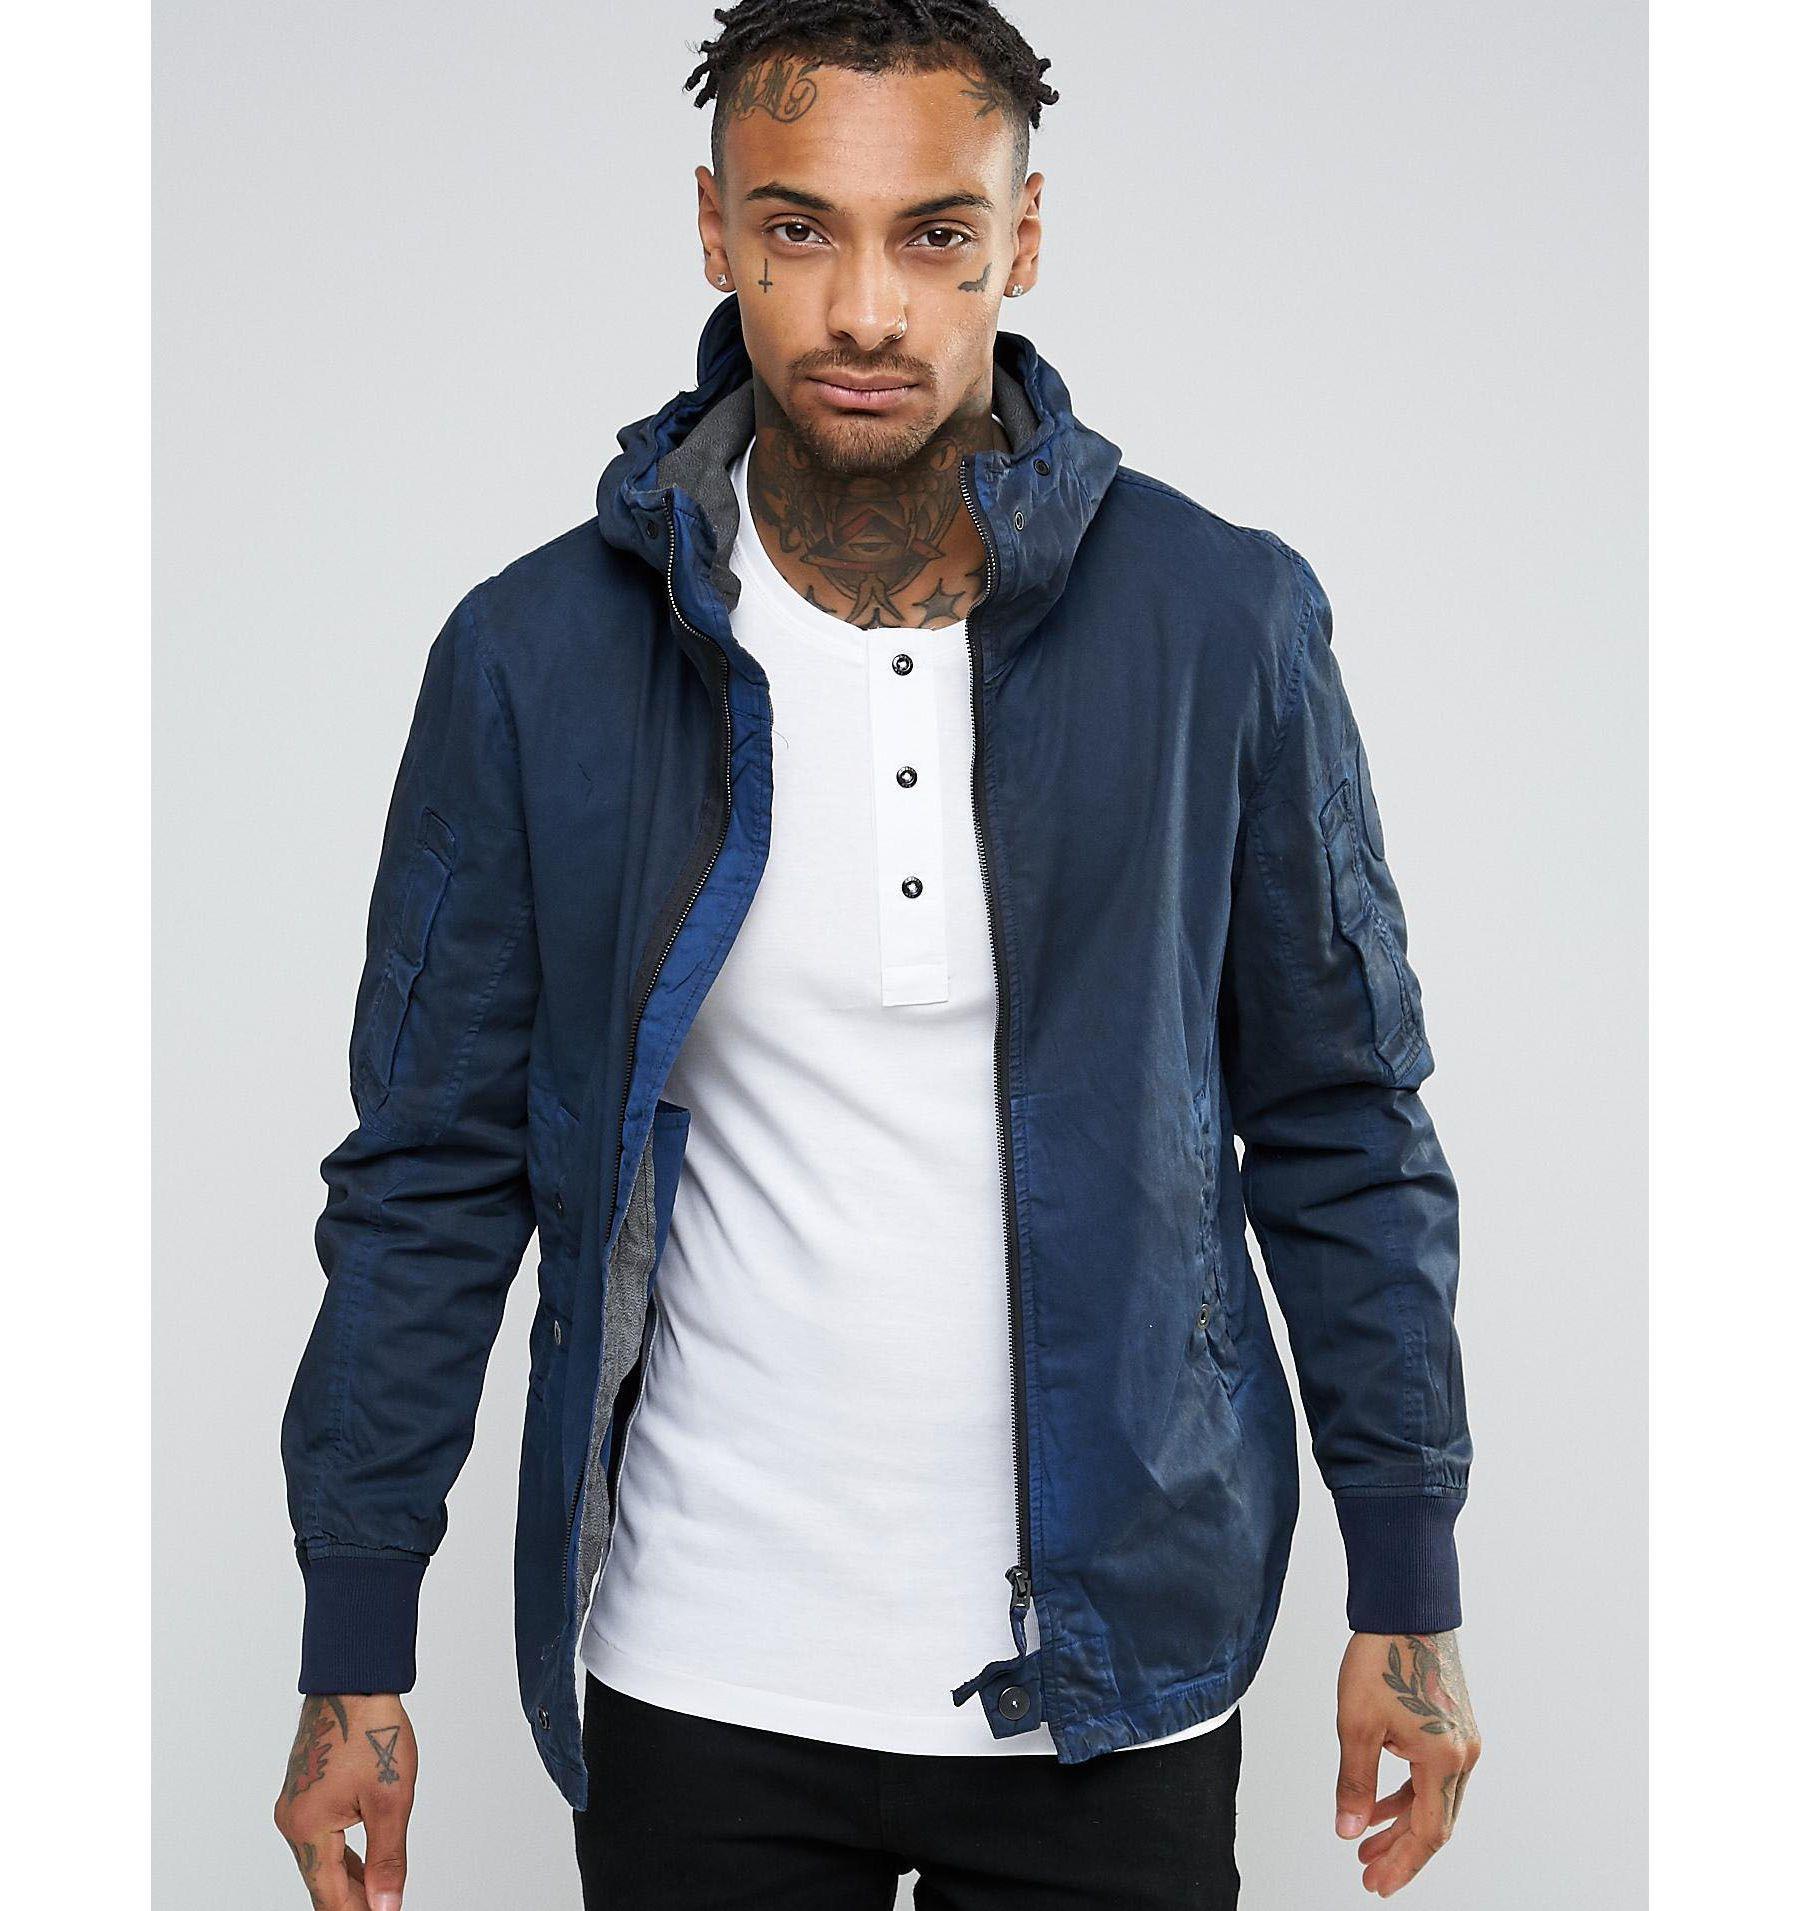 G-star raw Hudson Blue Shirt Jacket in Blue for Men | Lyst